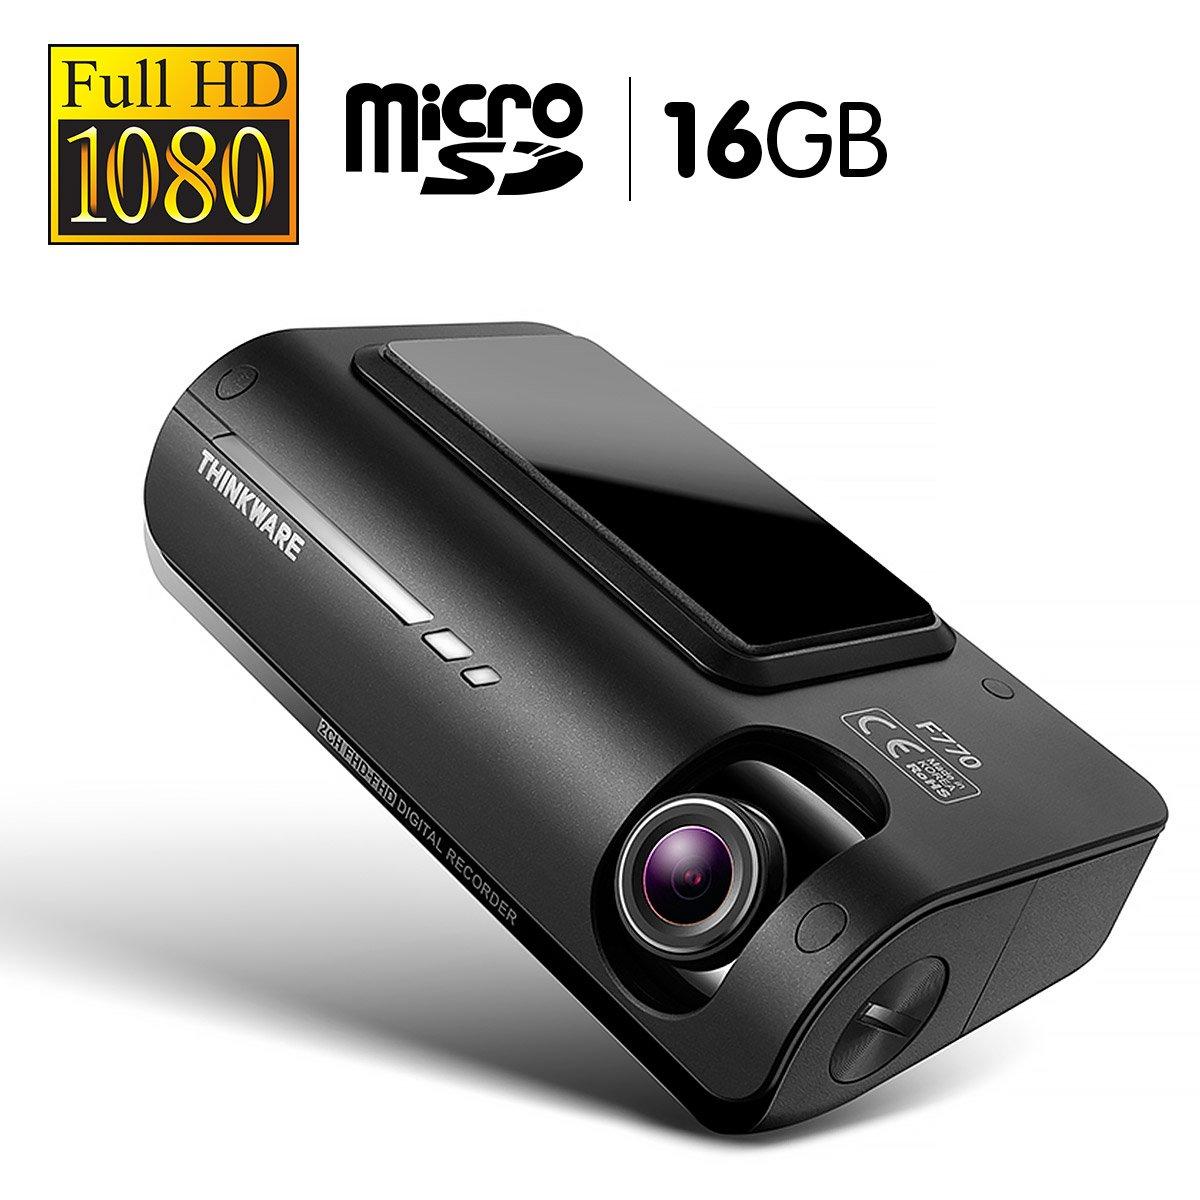 THINKWARE 1080P Full HD Dash Cam With 16GB Micro SD - F77016